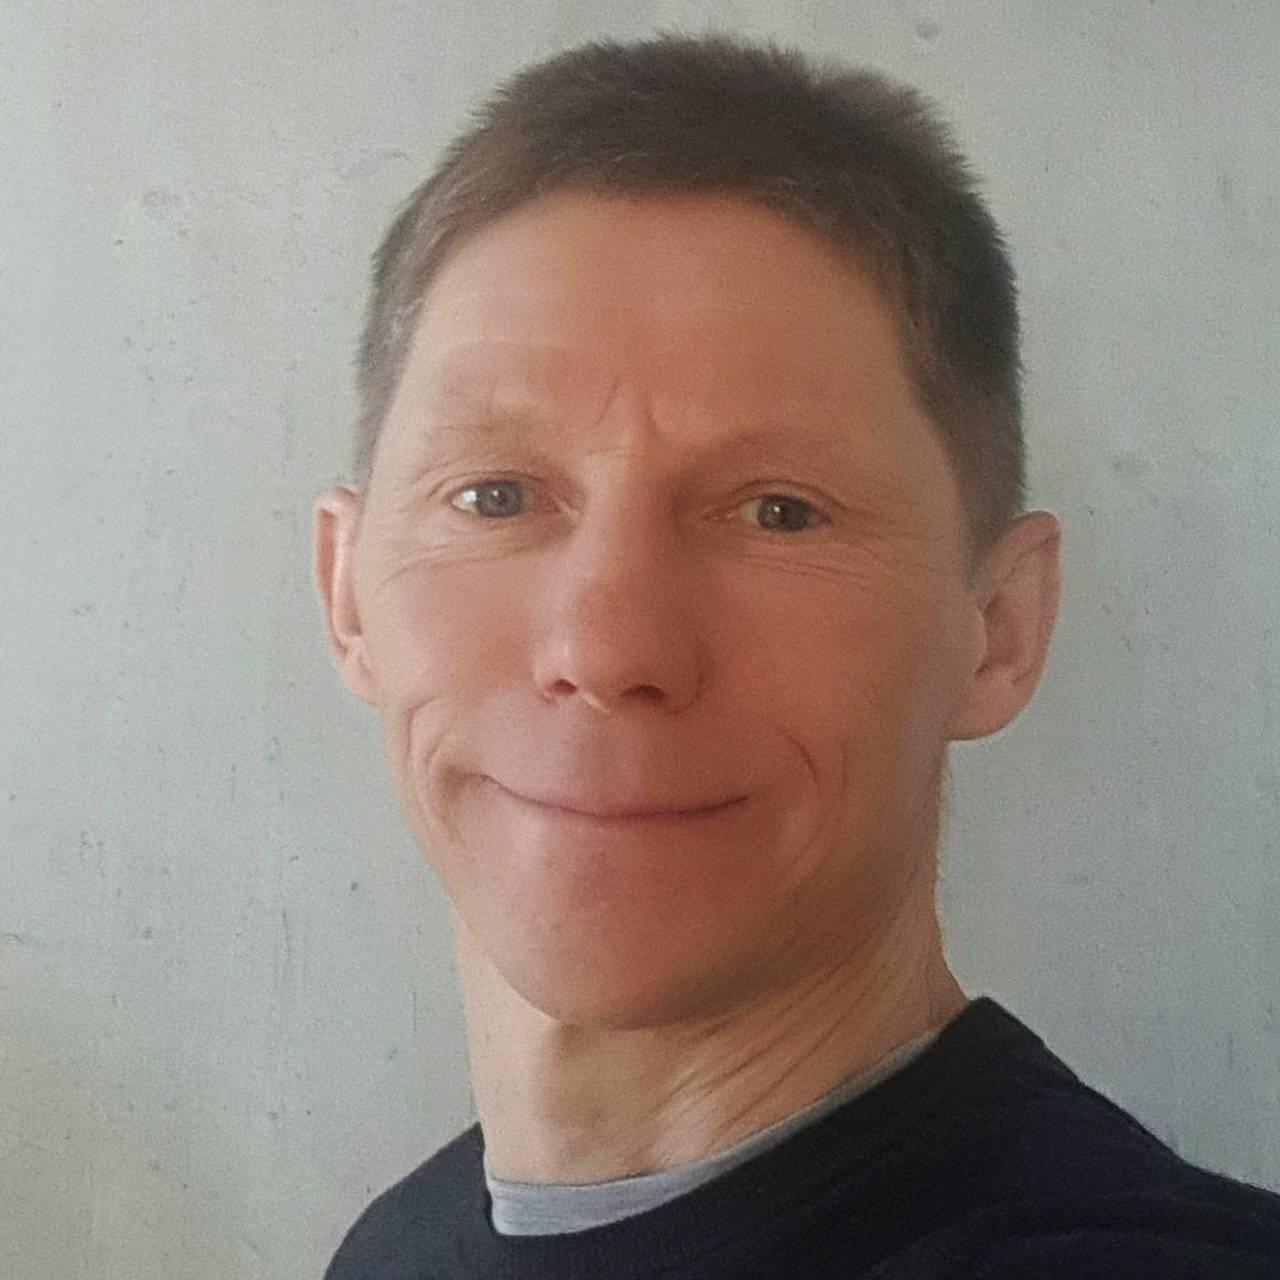 Bilde av Per Olaf Persen (55)